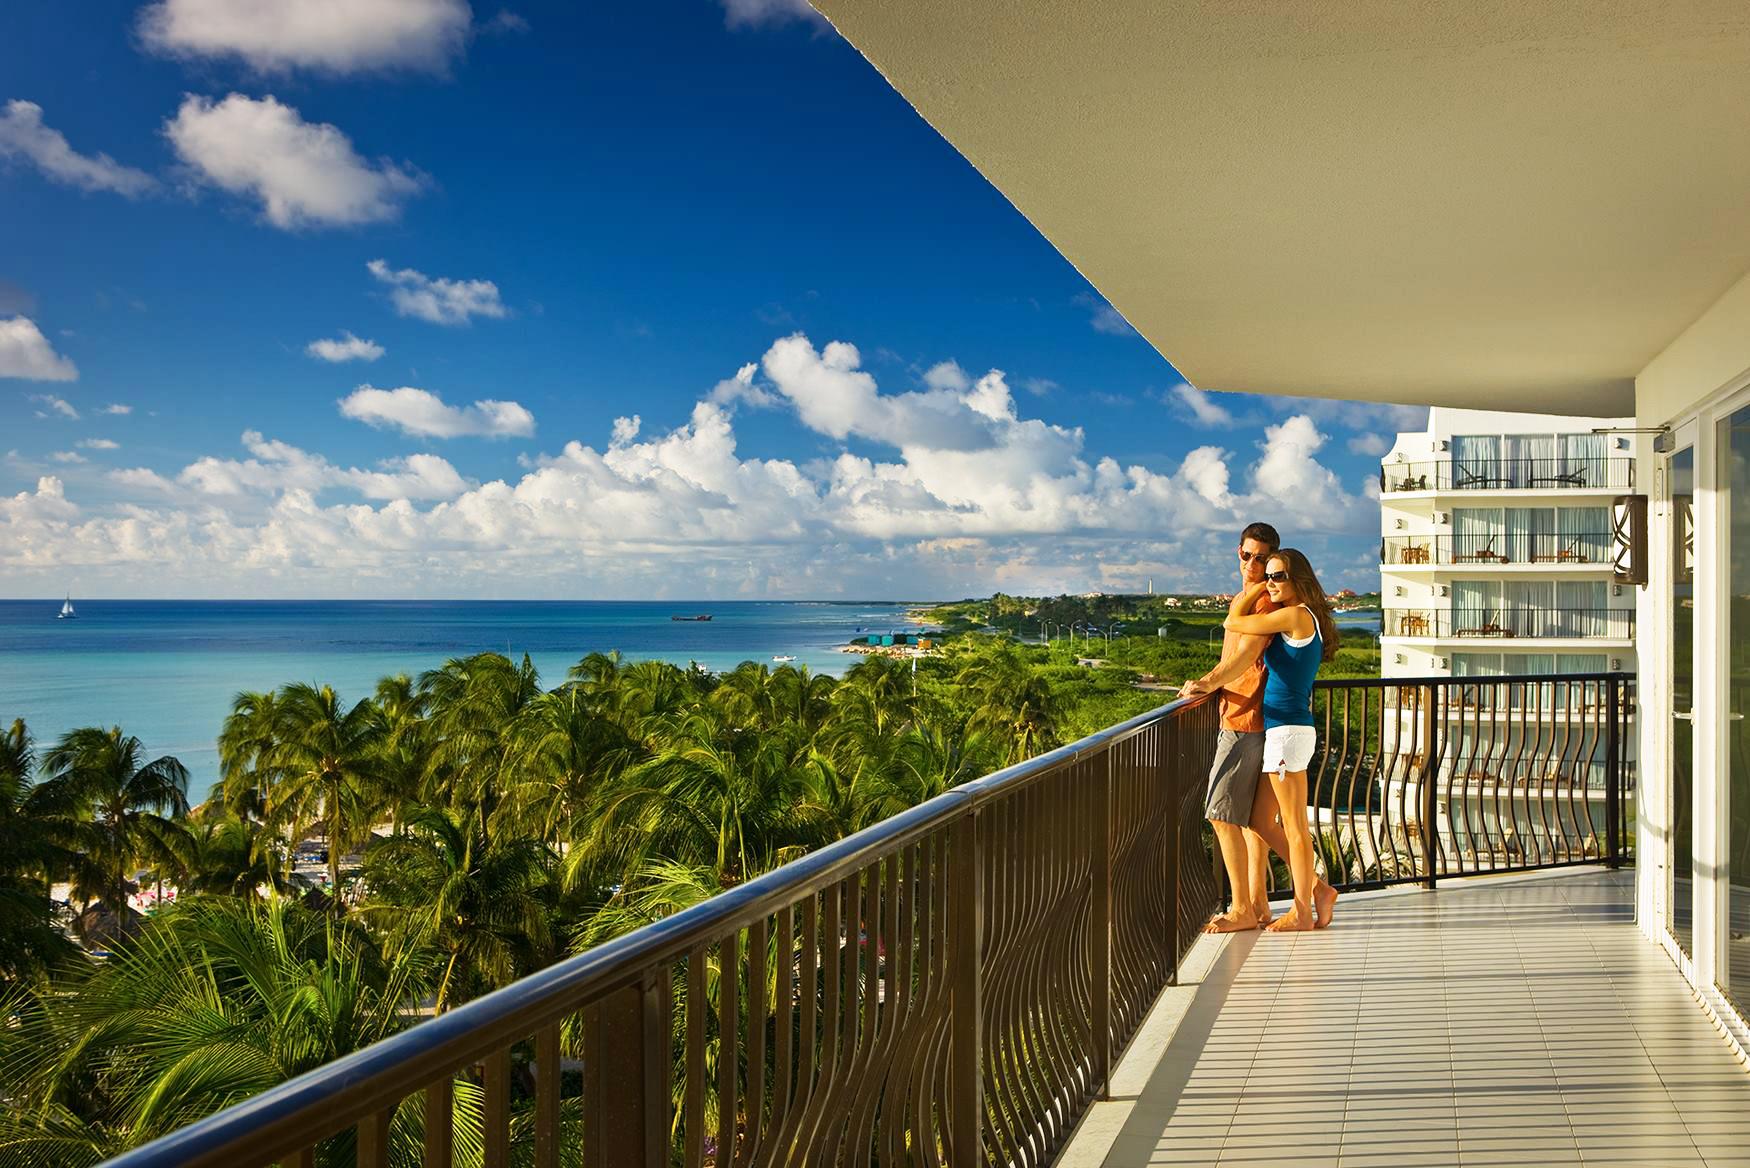 Interview: Tom Calame, GM Of The Aruba Marriott Resort & Stellaris Casino